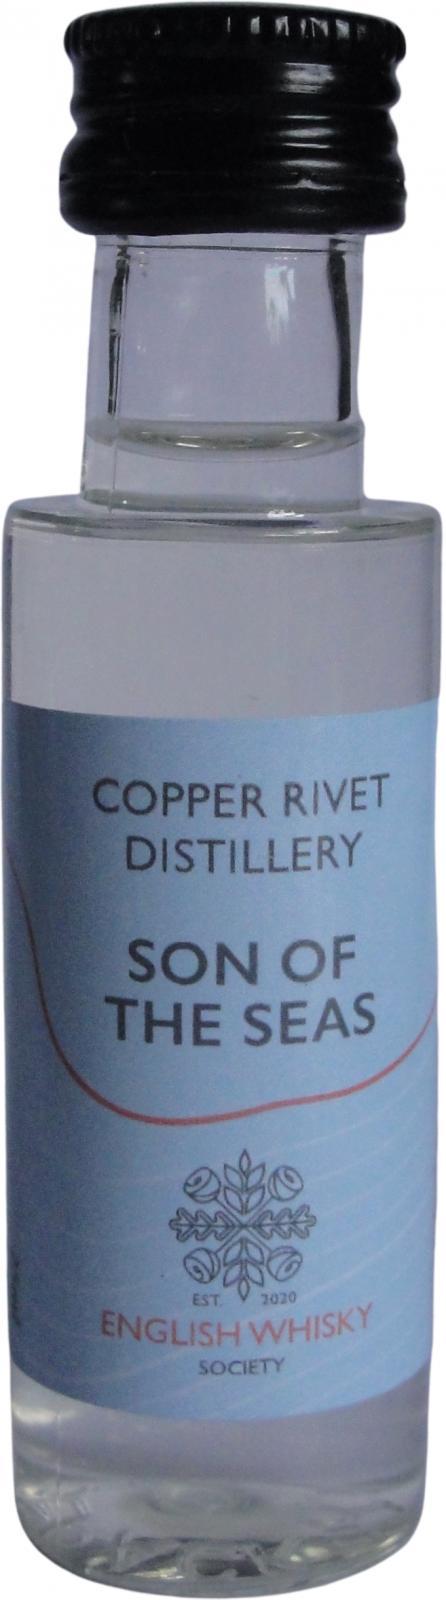 Copper Rivet Son of the Seas Sample TDT